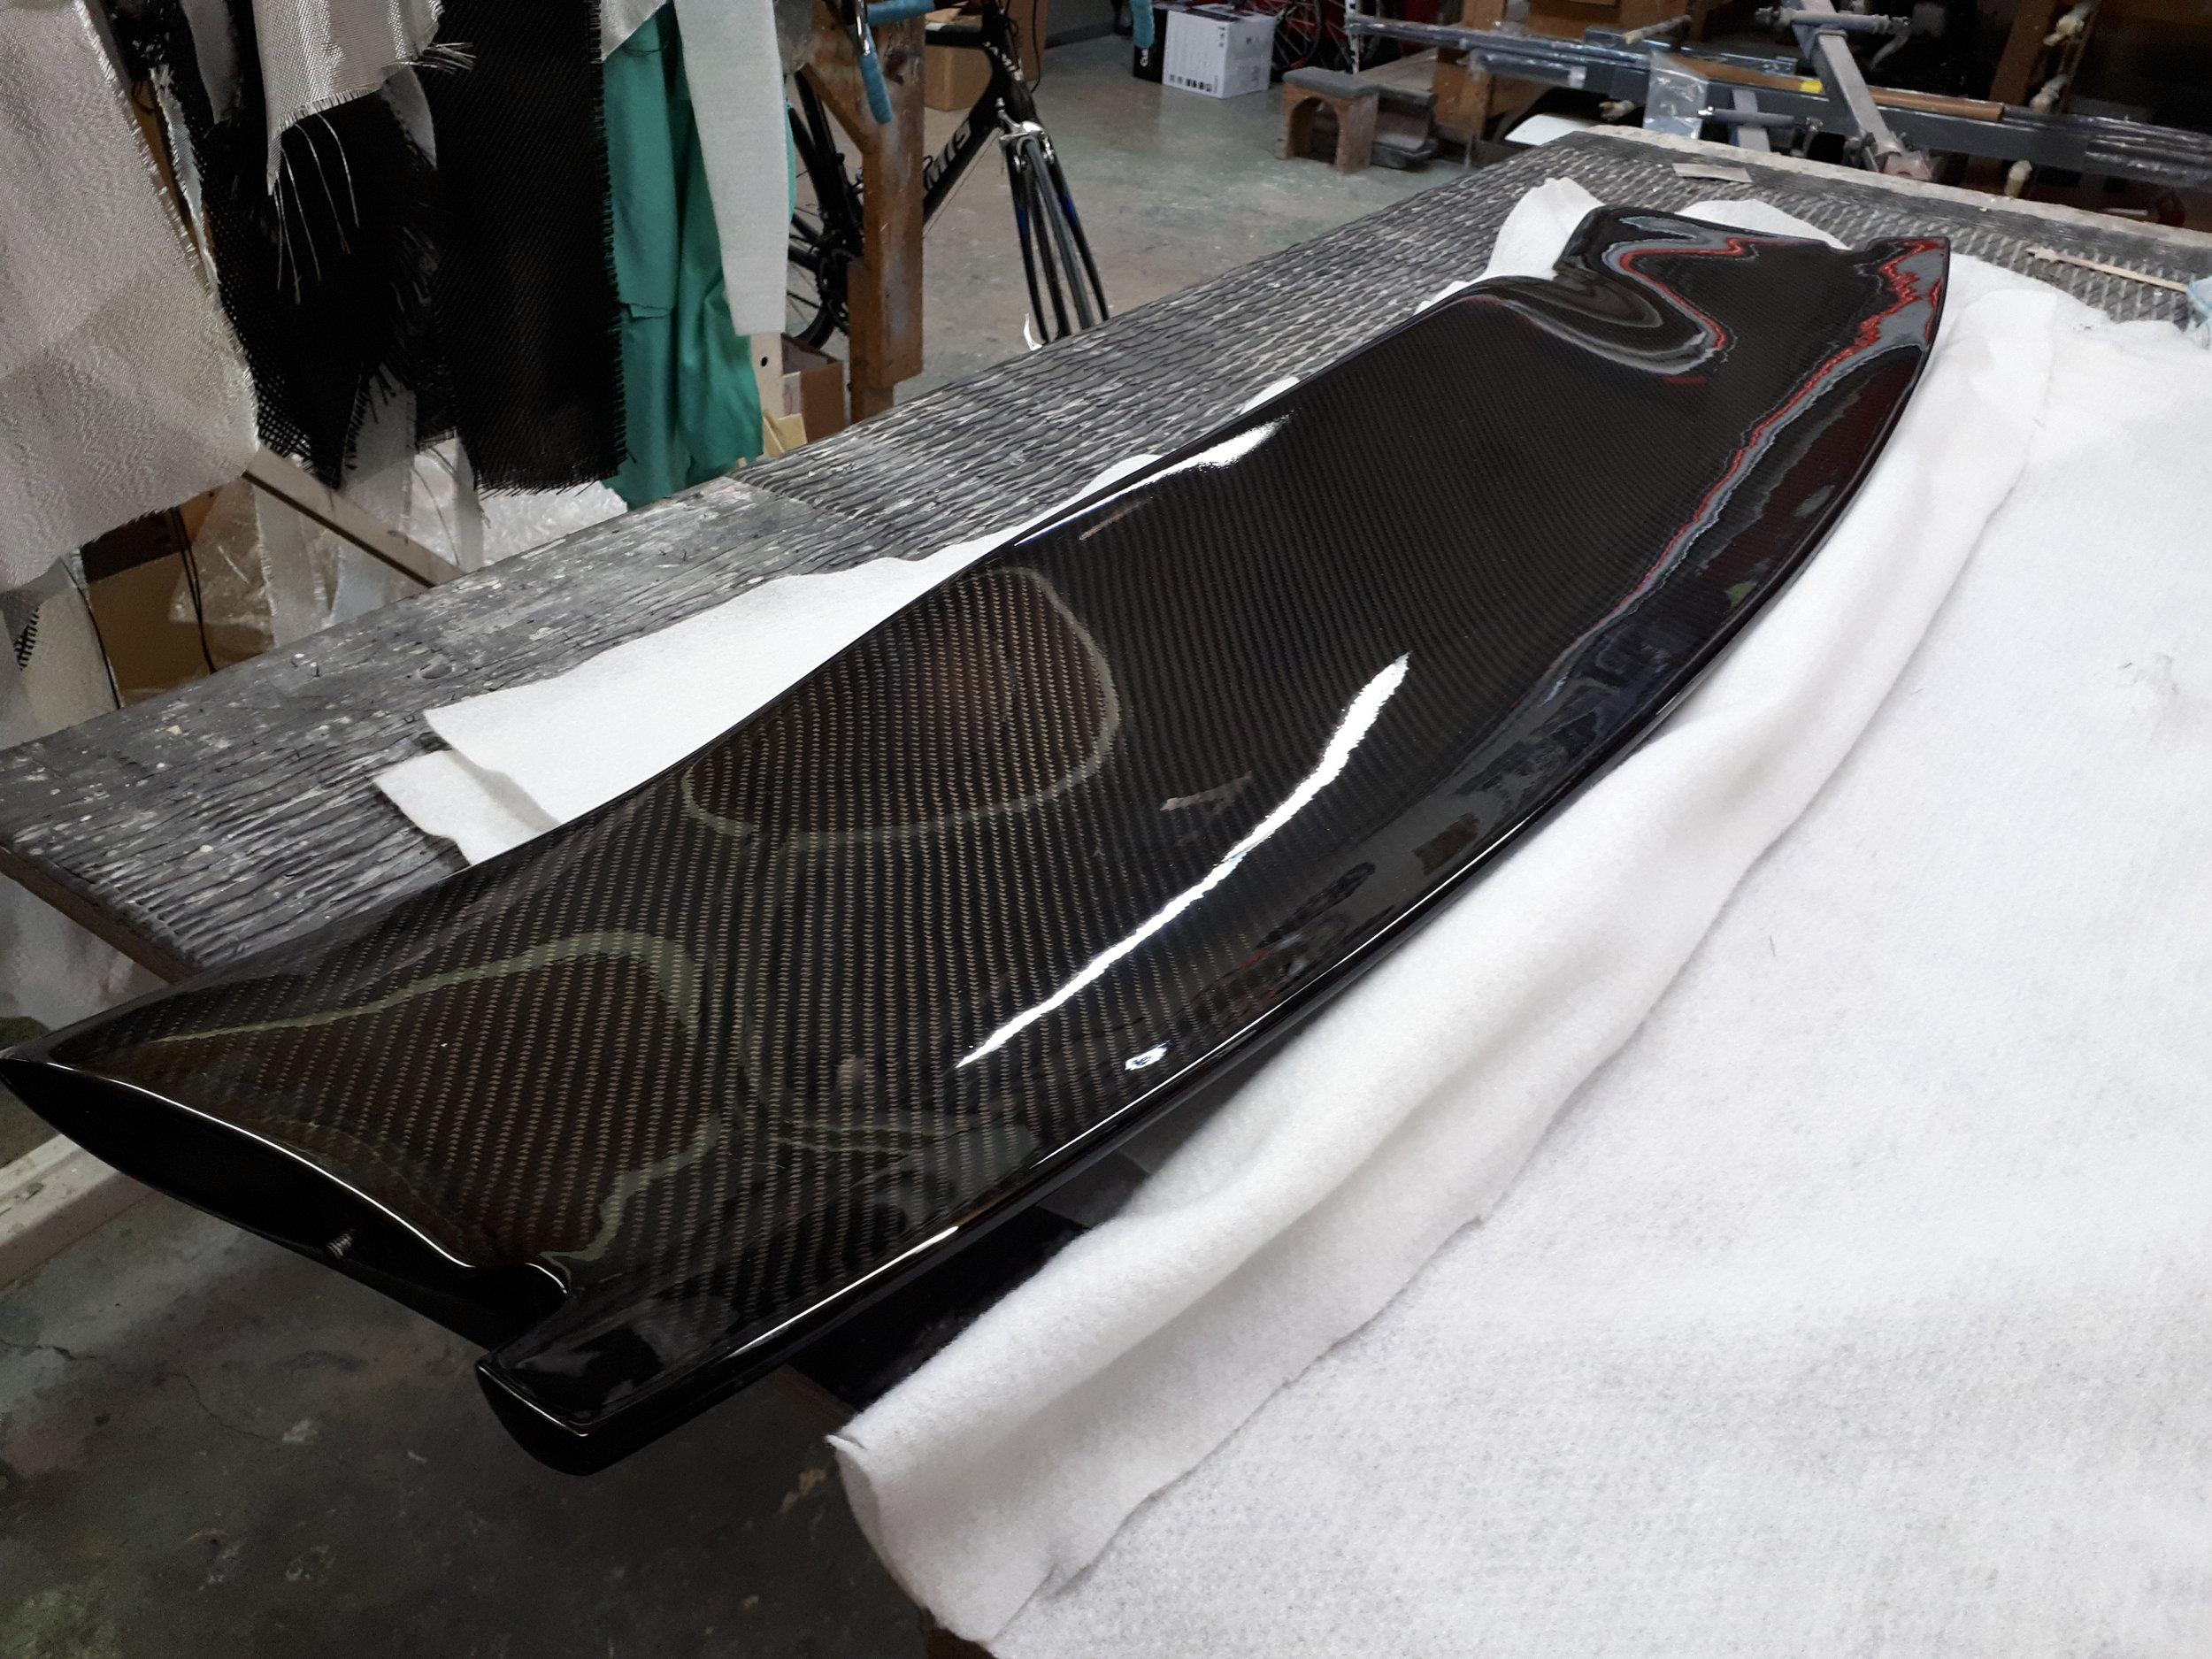 Mitsubishi Evo Spoiler Repair & Restore